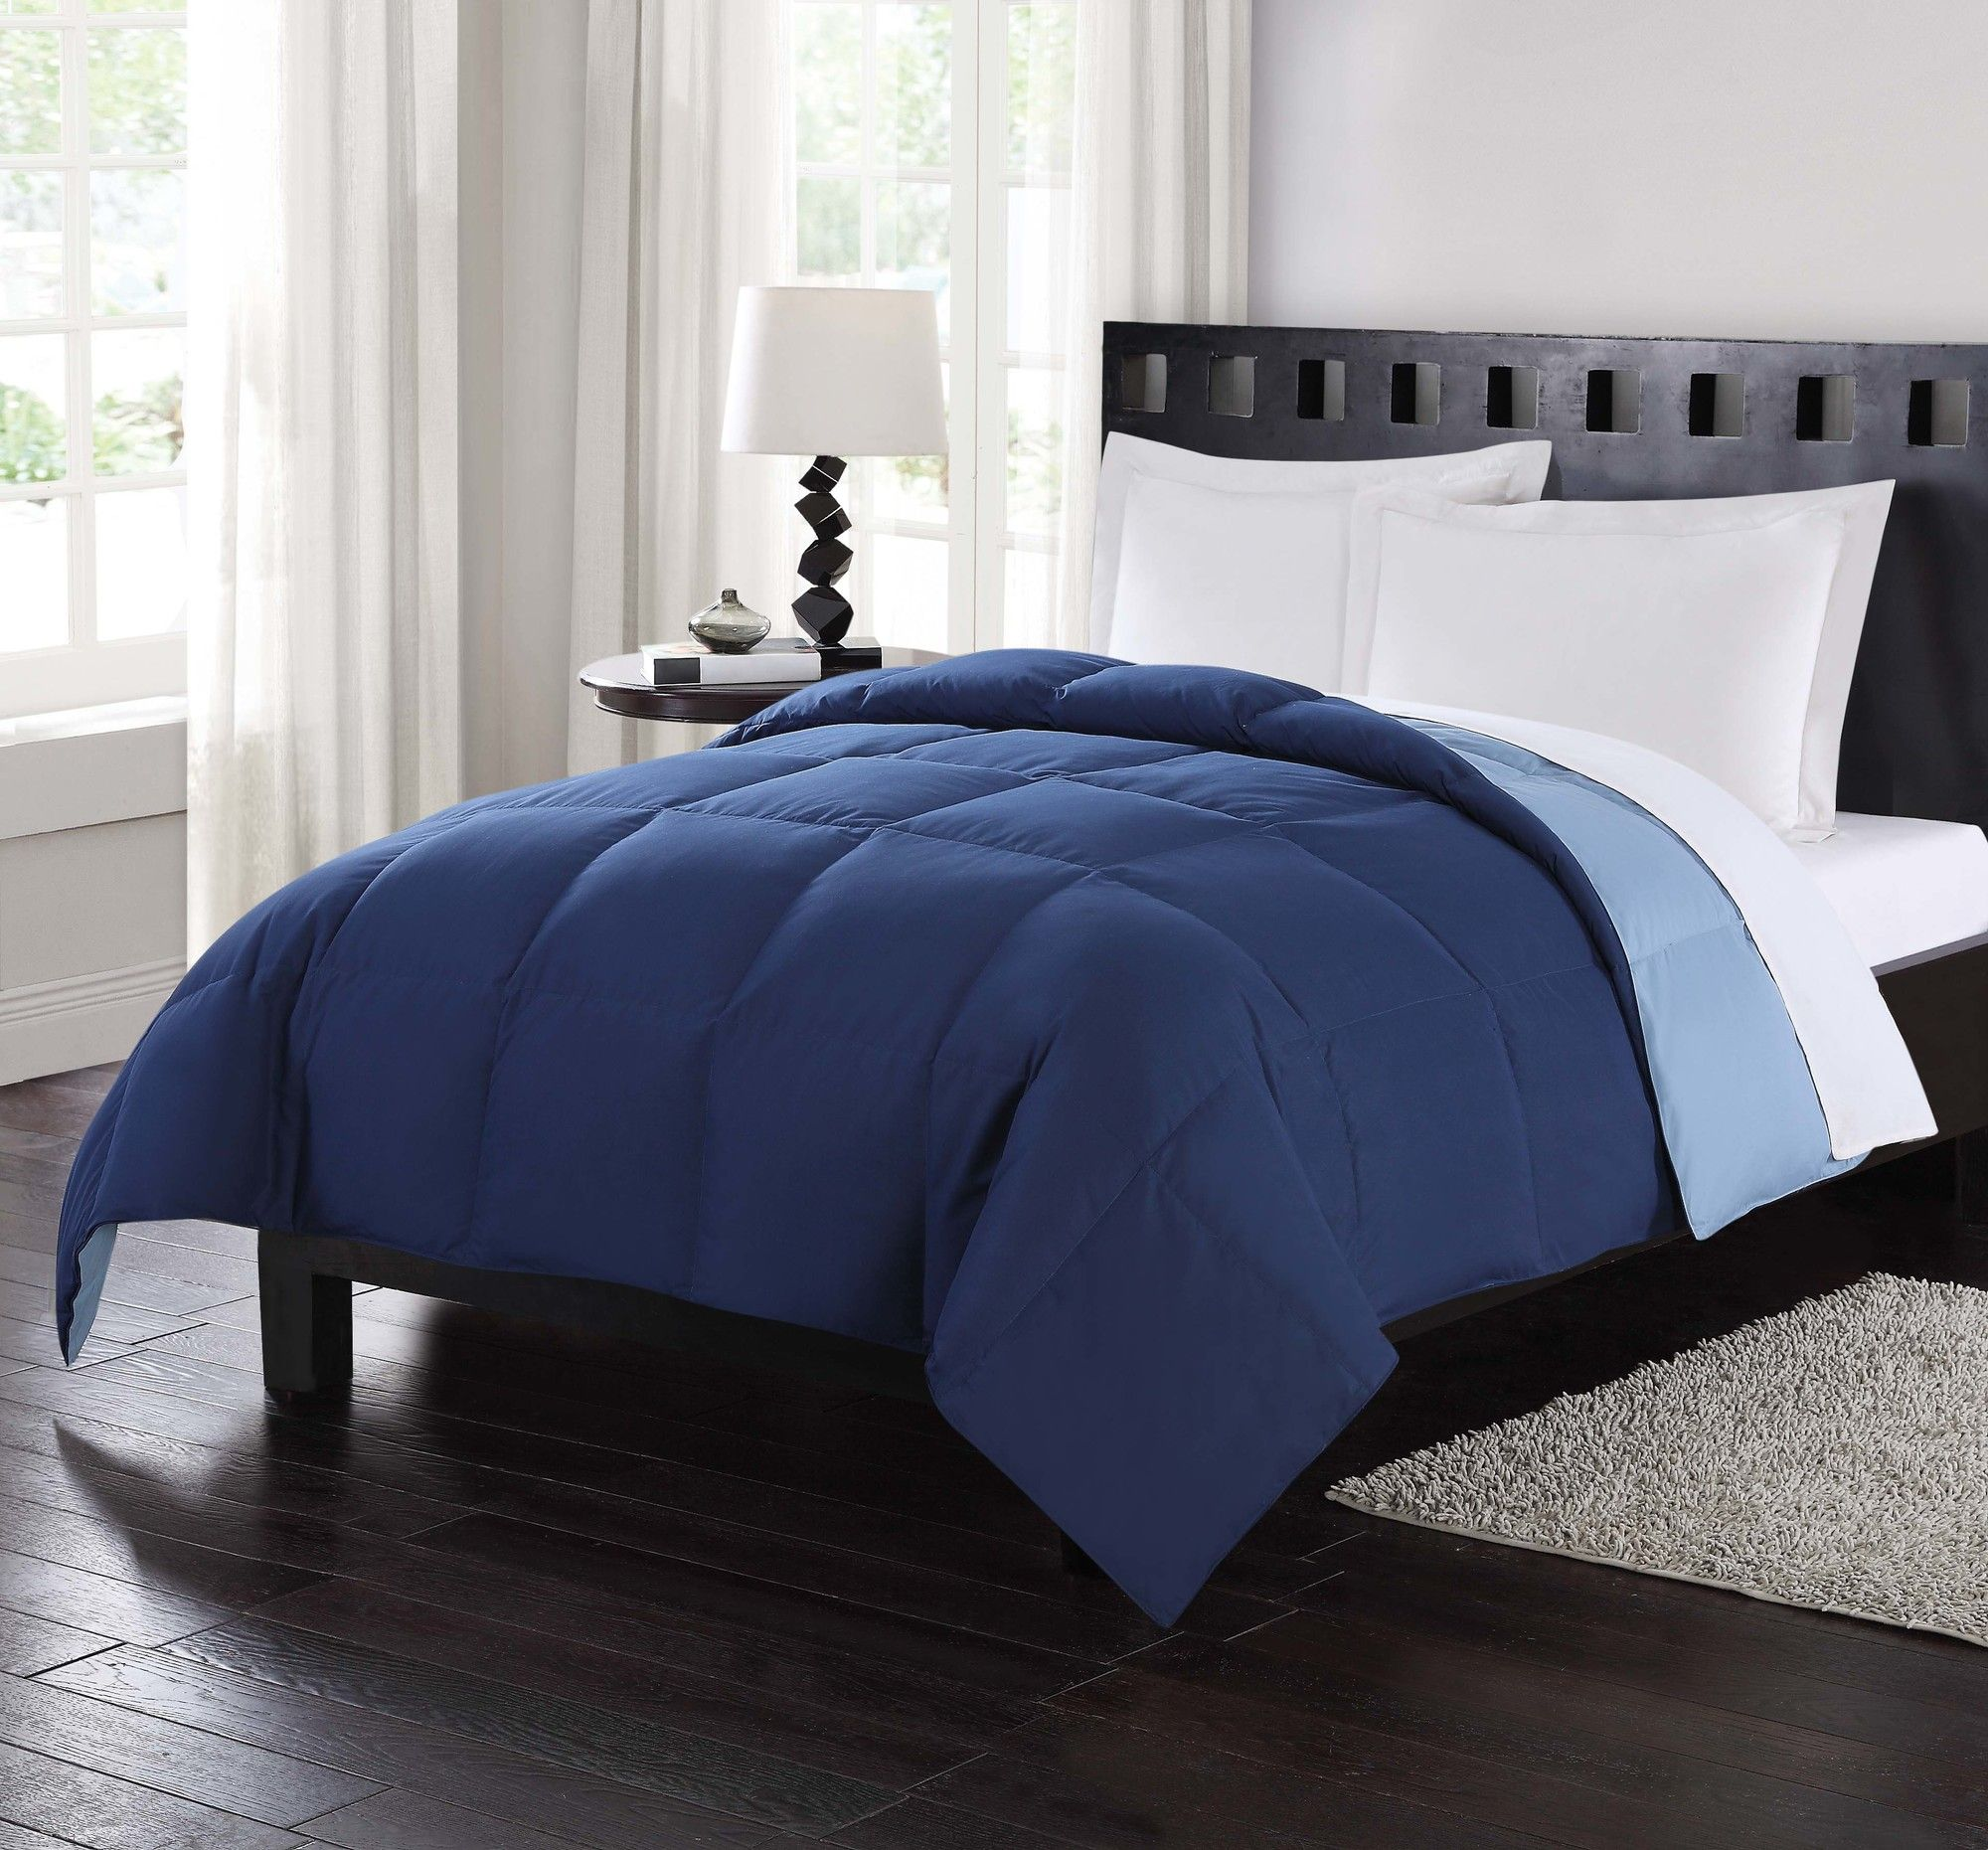 Reversible All Season Down Comforter Down comforter